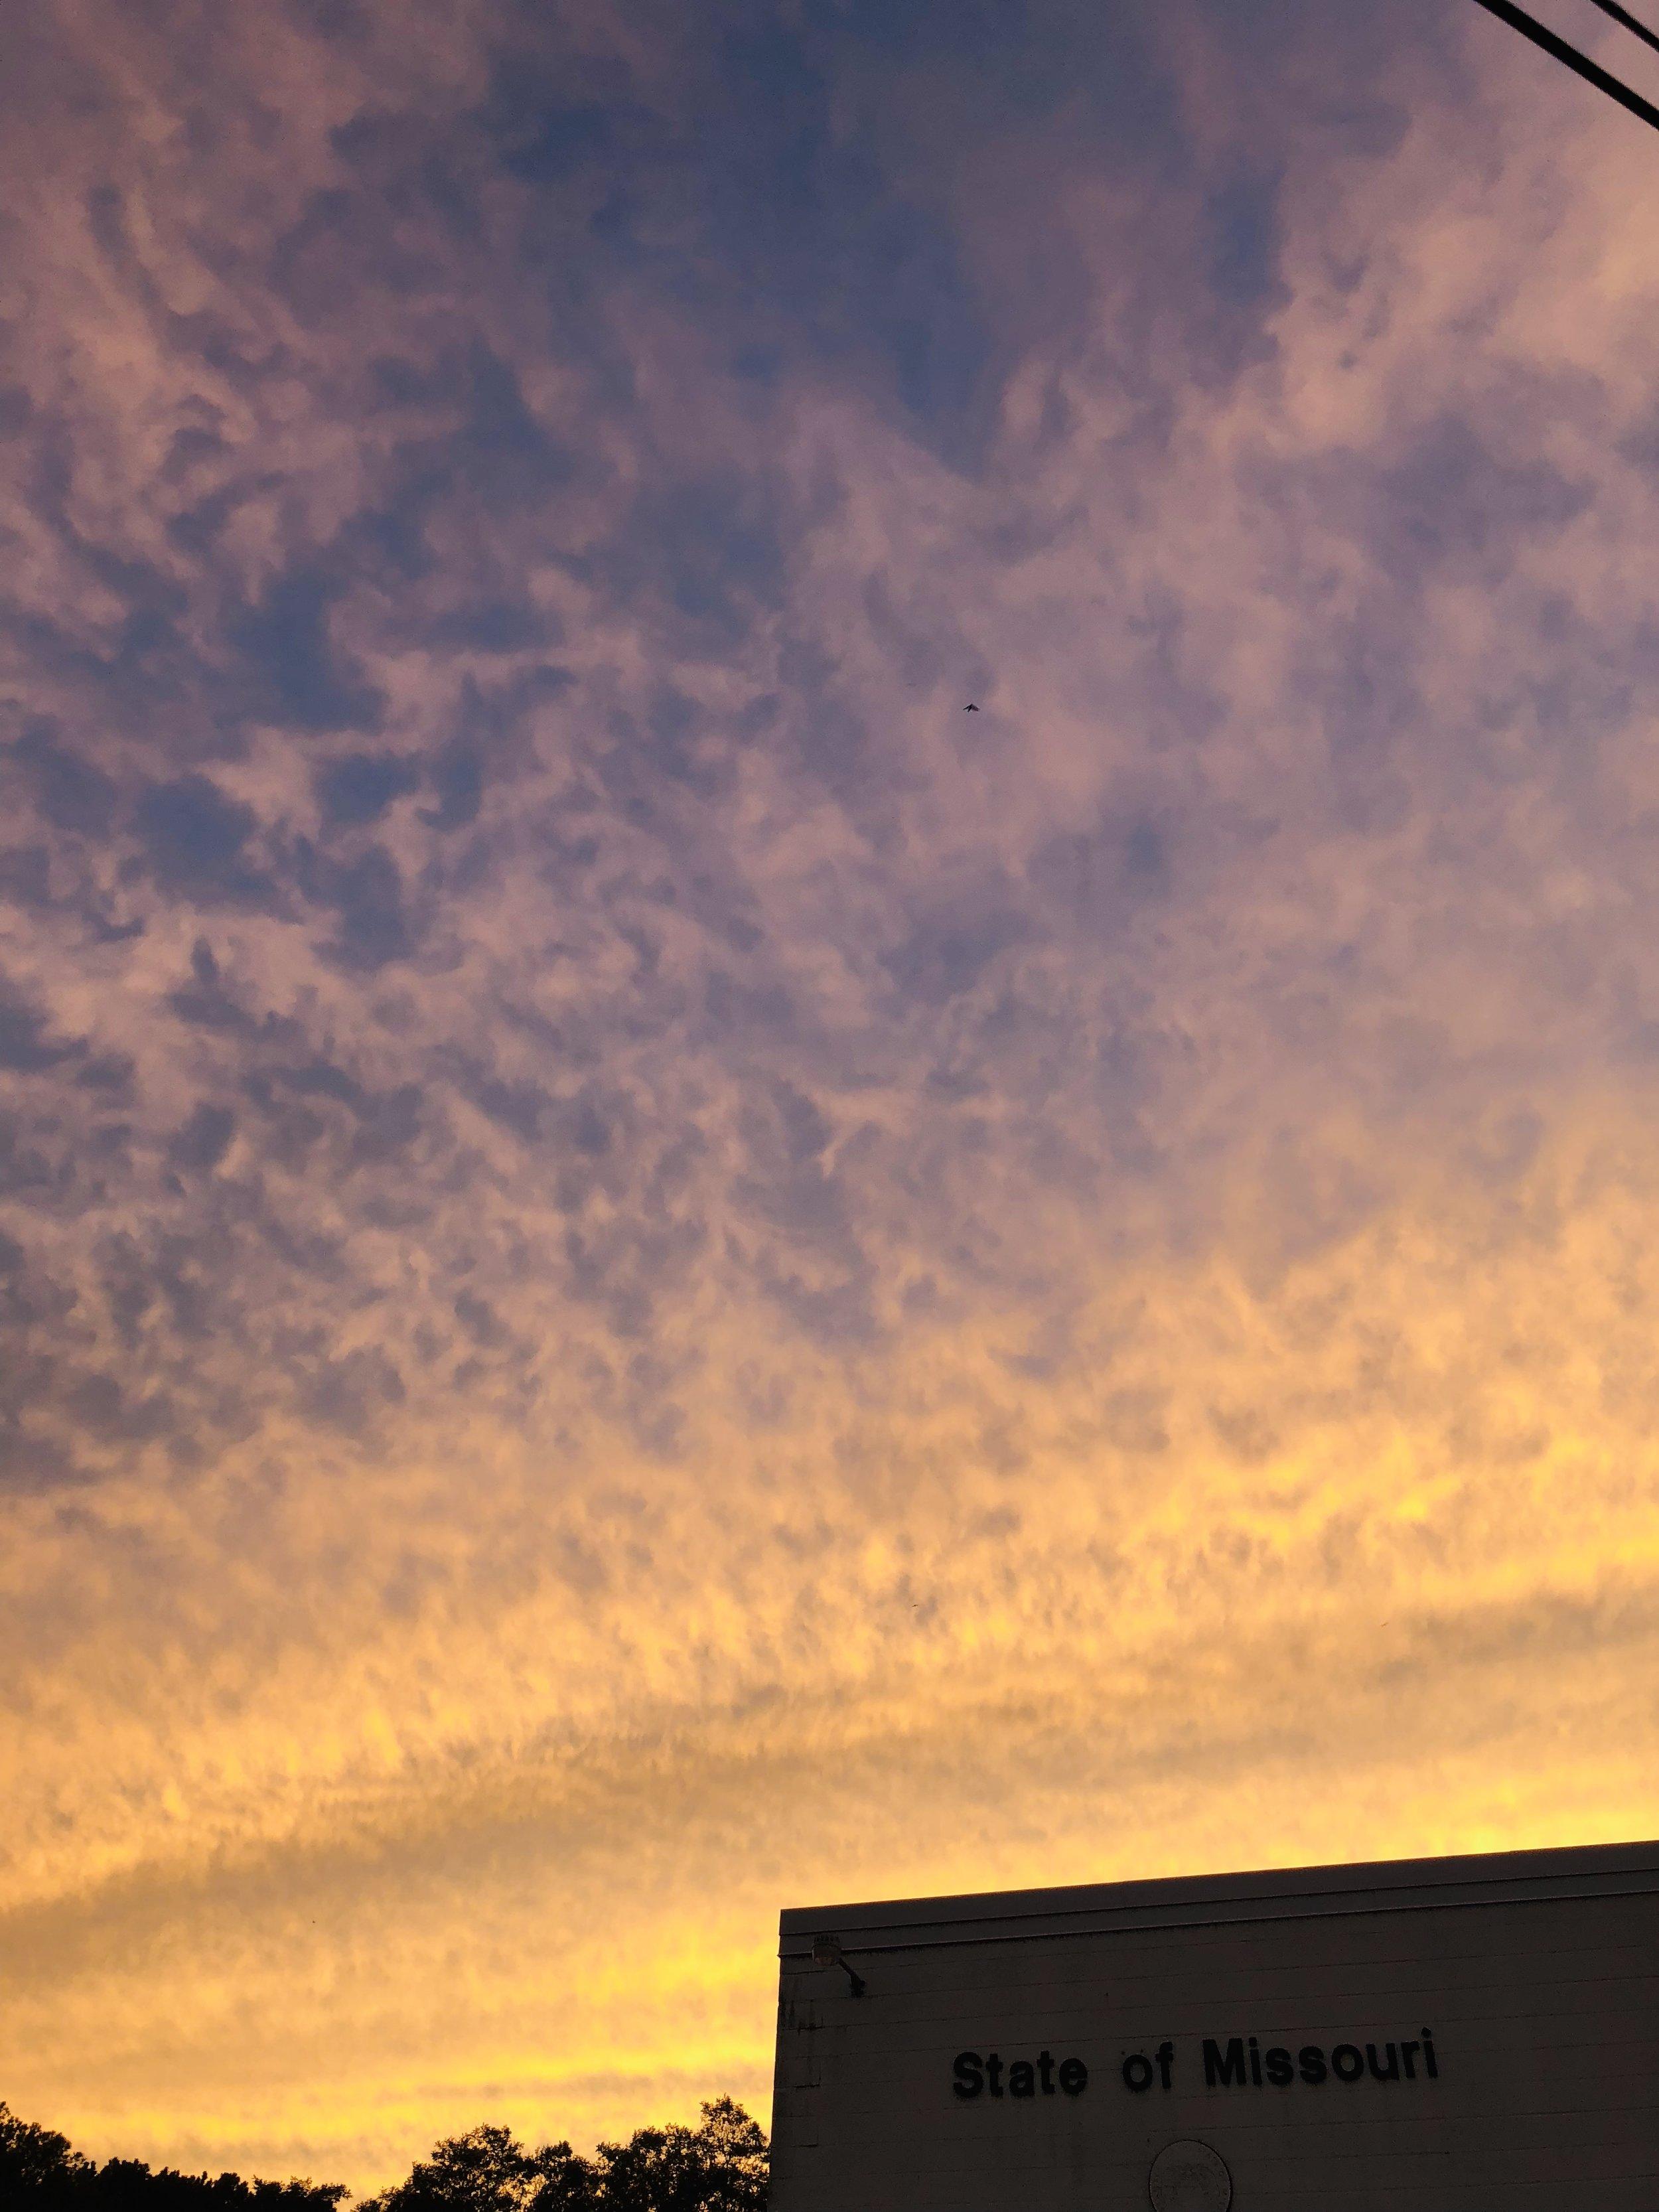 jefferson-city-mo-state-of-mo-sunset-color-sky-jeff-city-beautiful